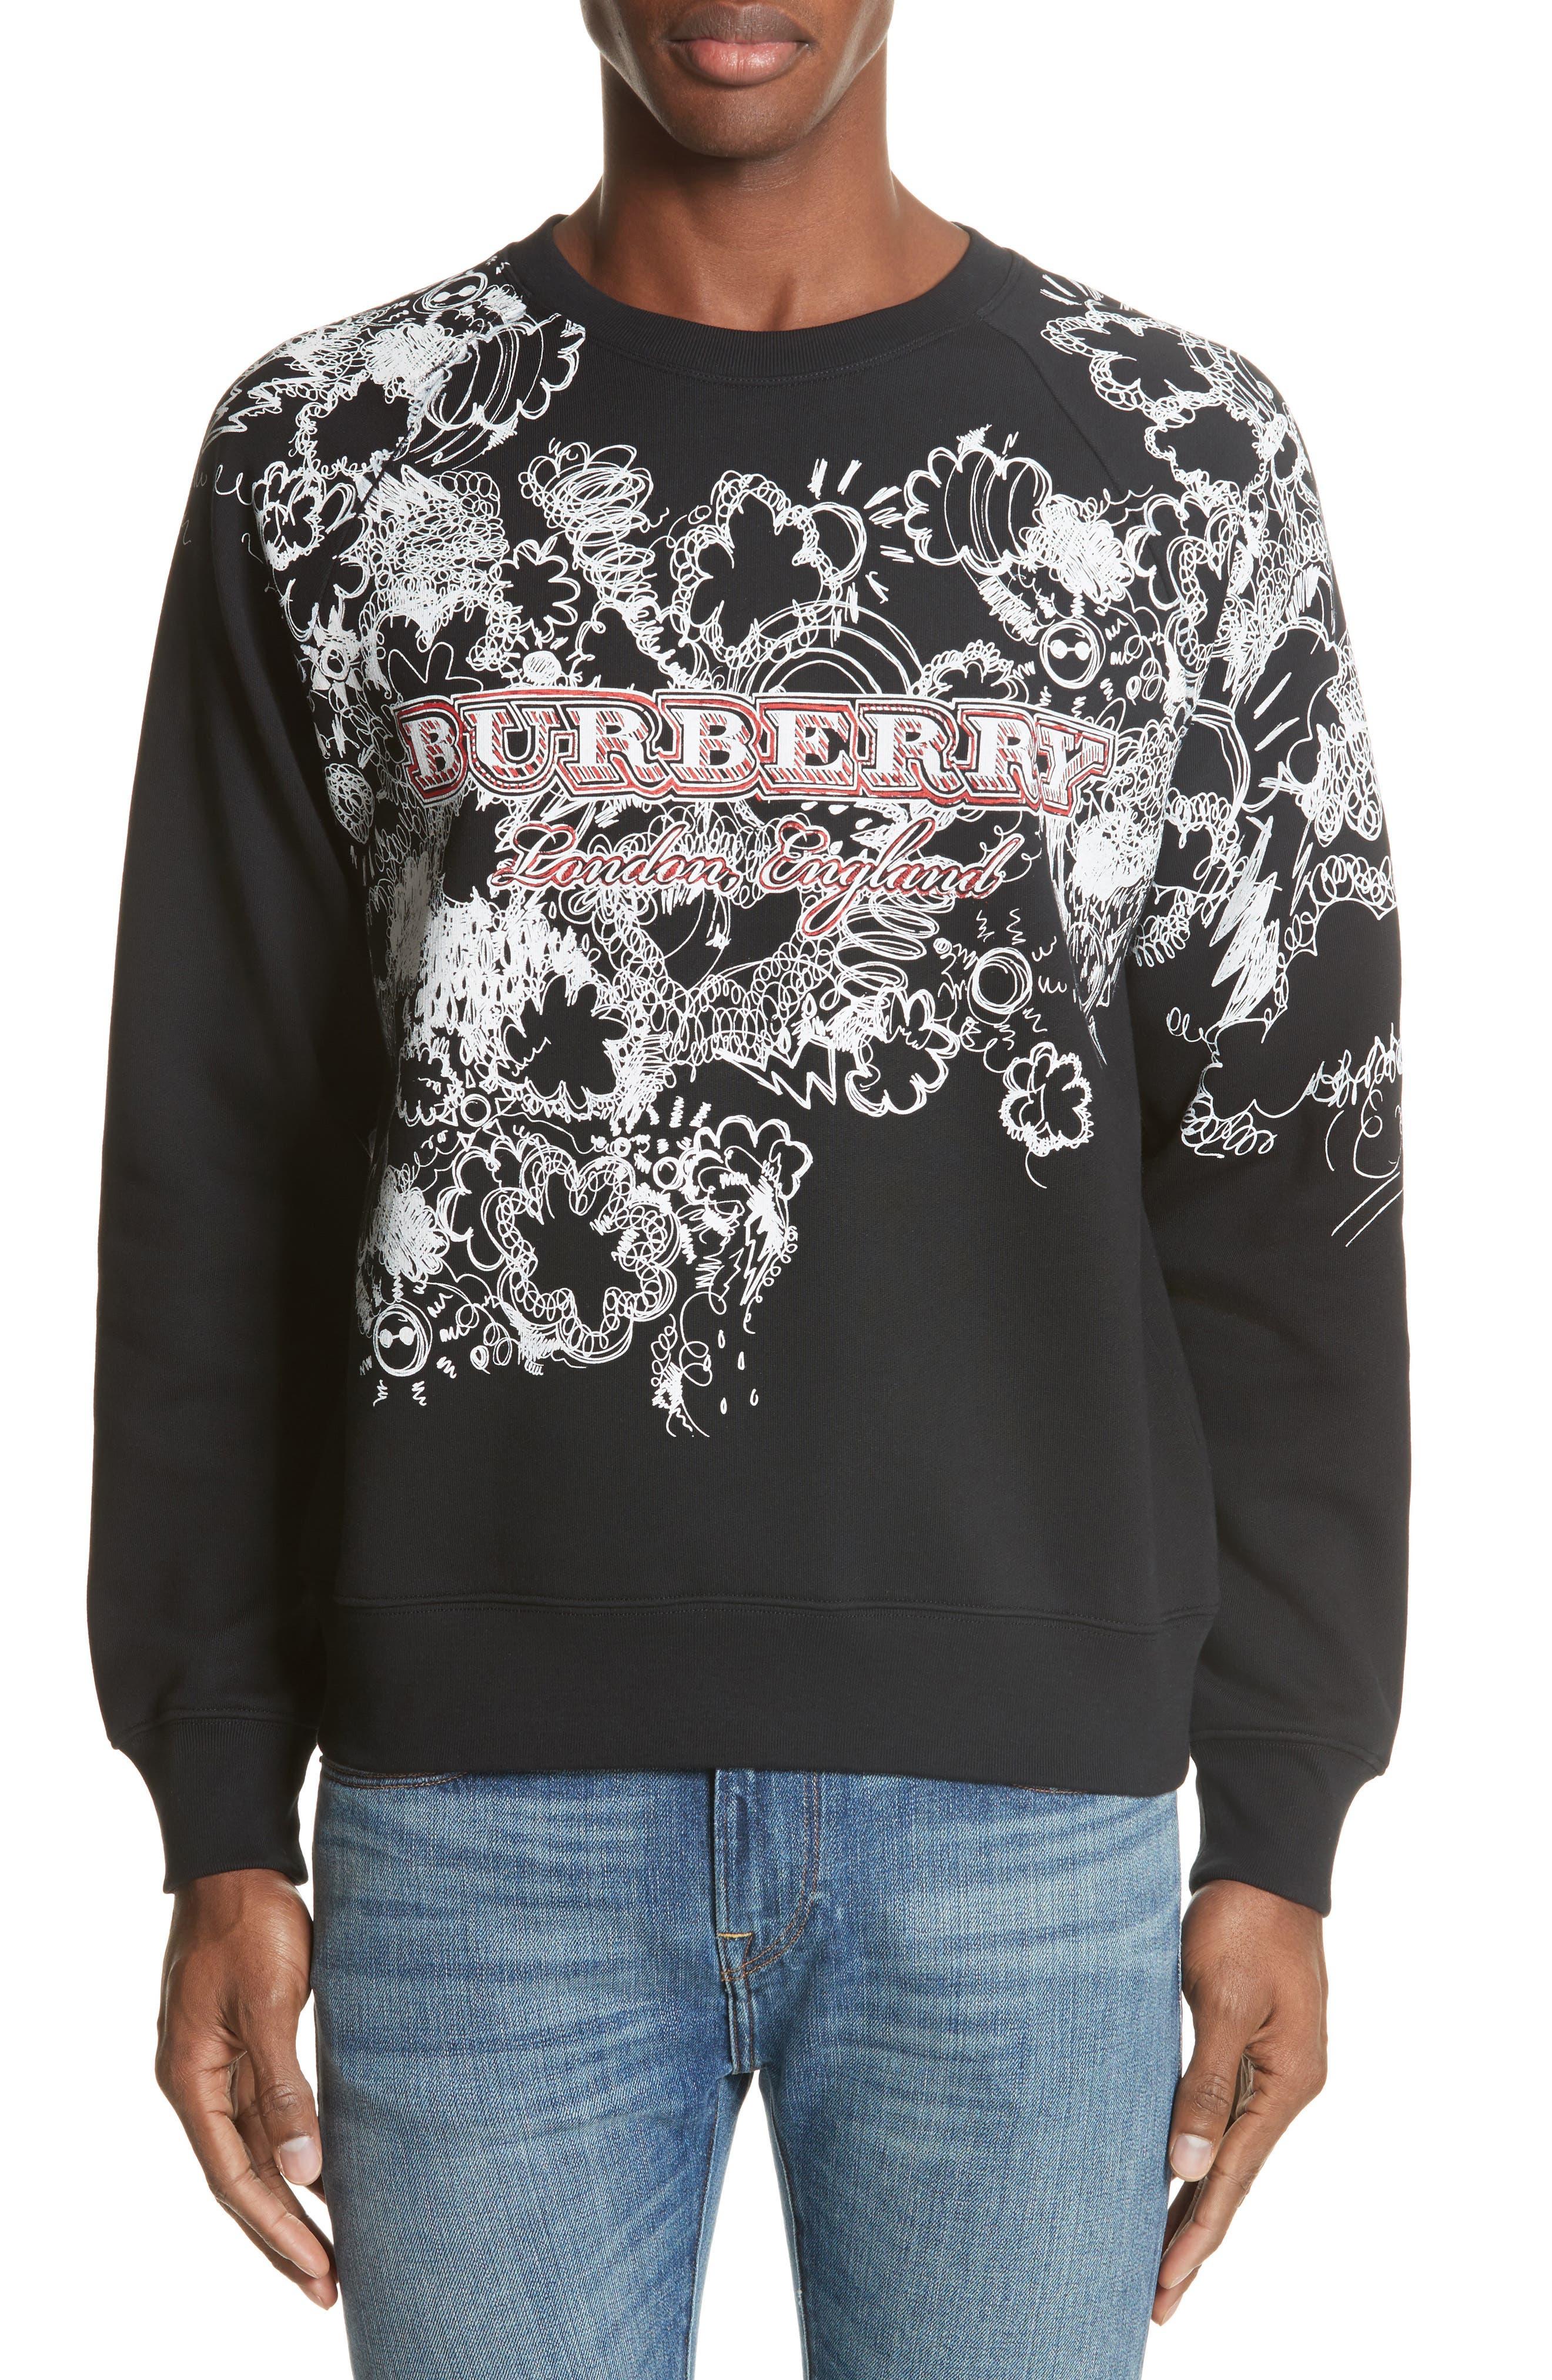 Barford Crewneck Sweatshirt,                             Main thumbnail 1, color,                             Black